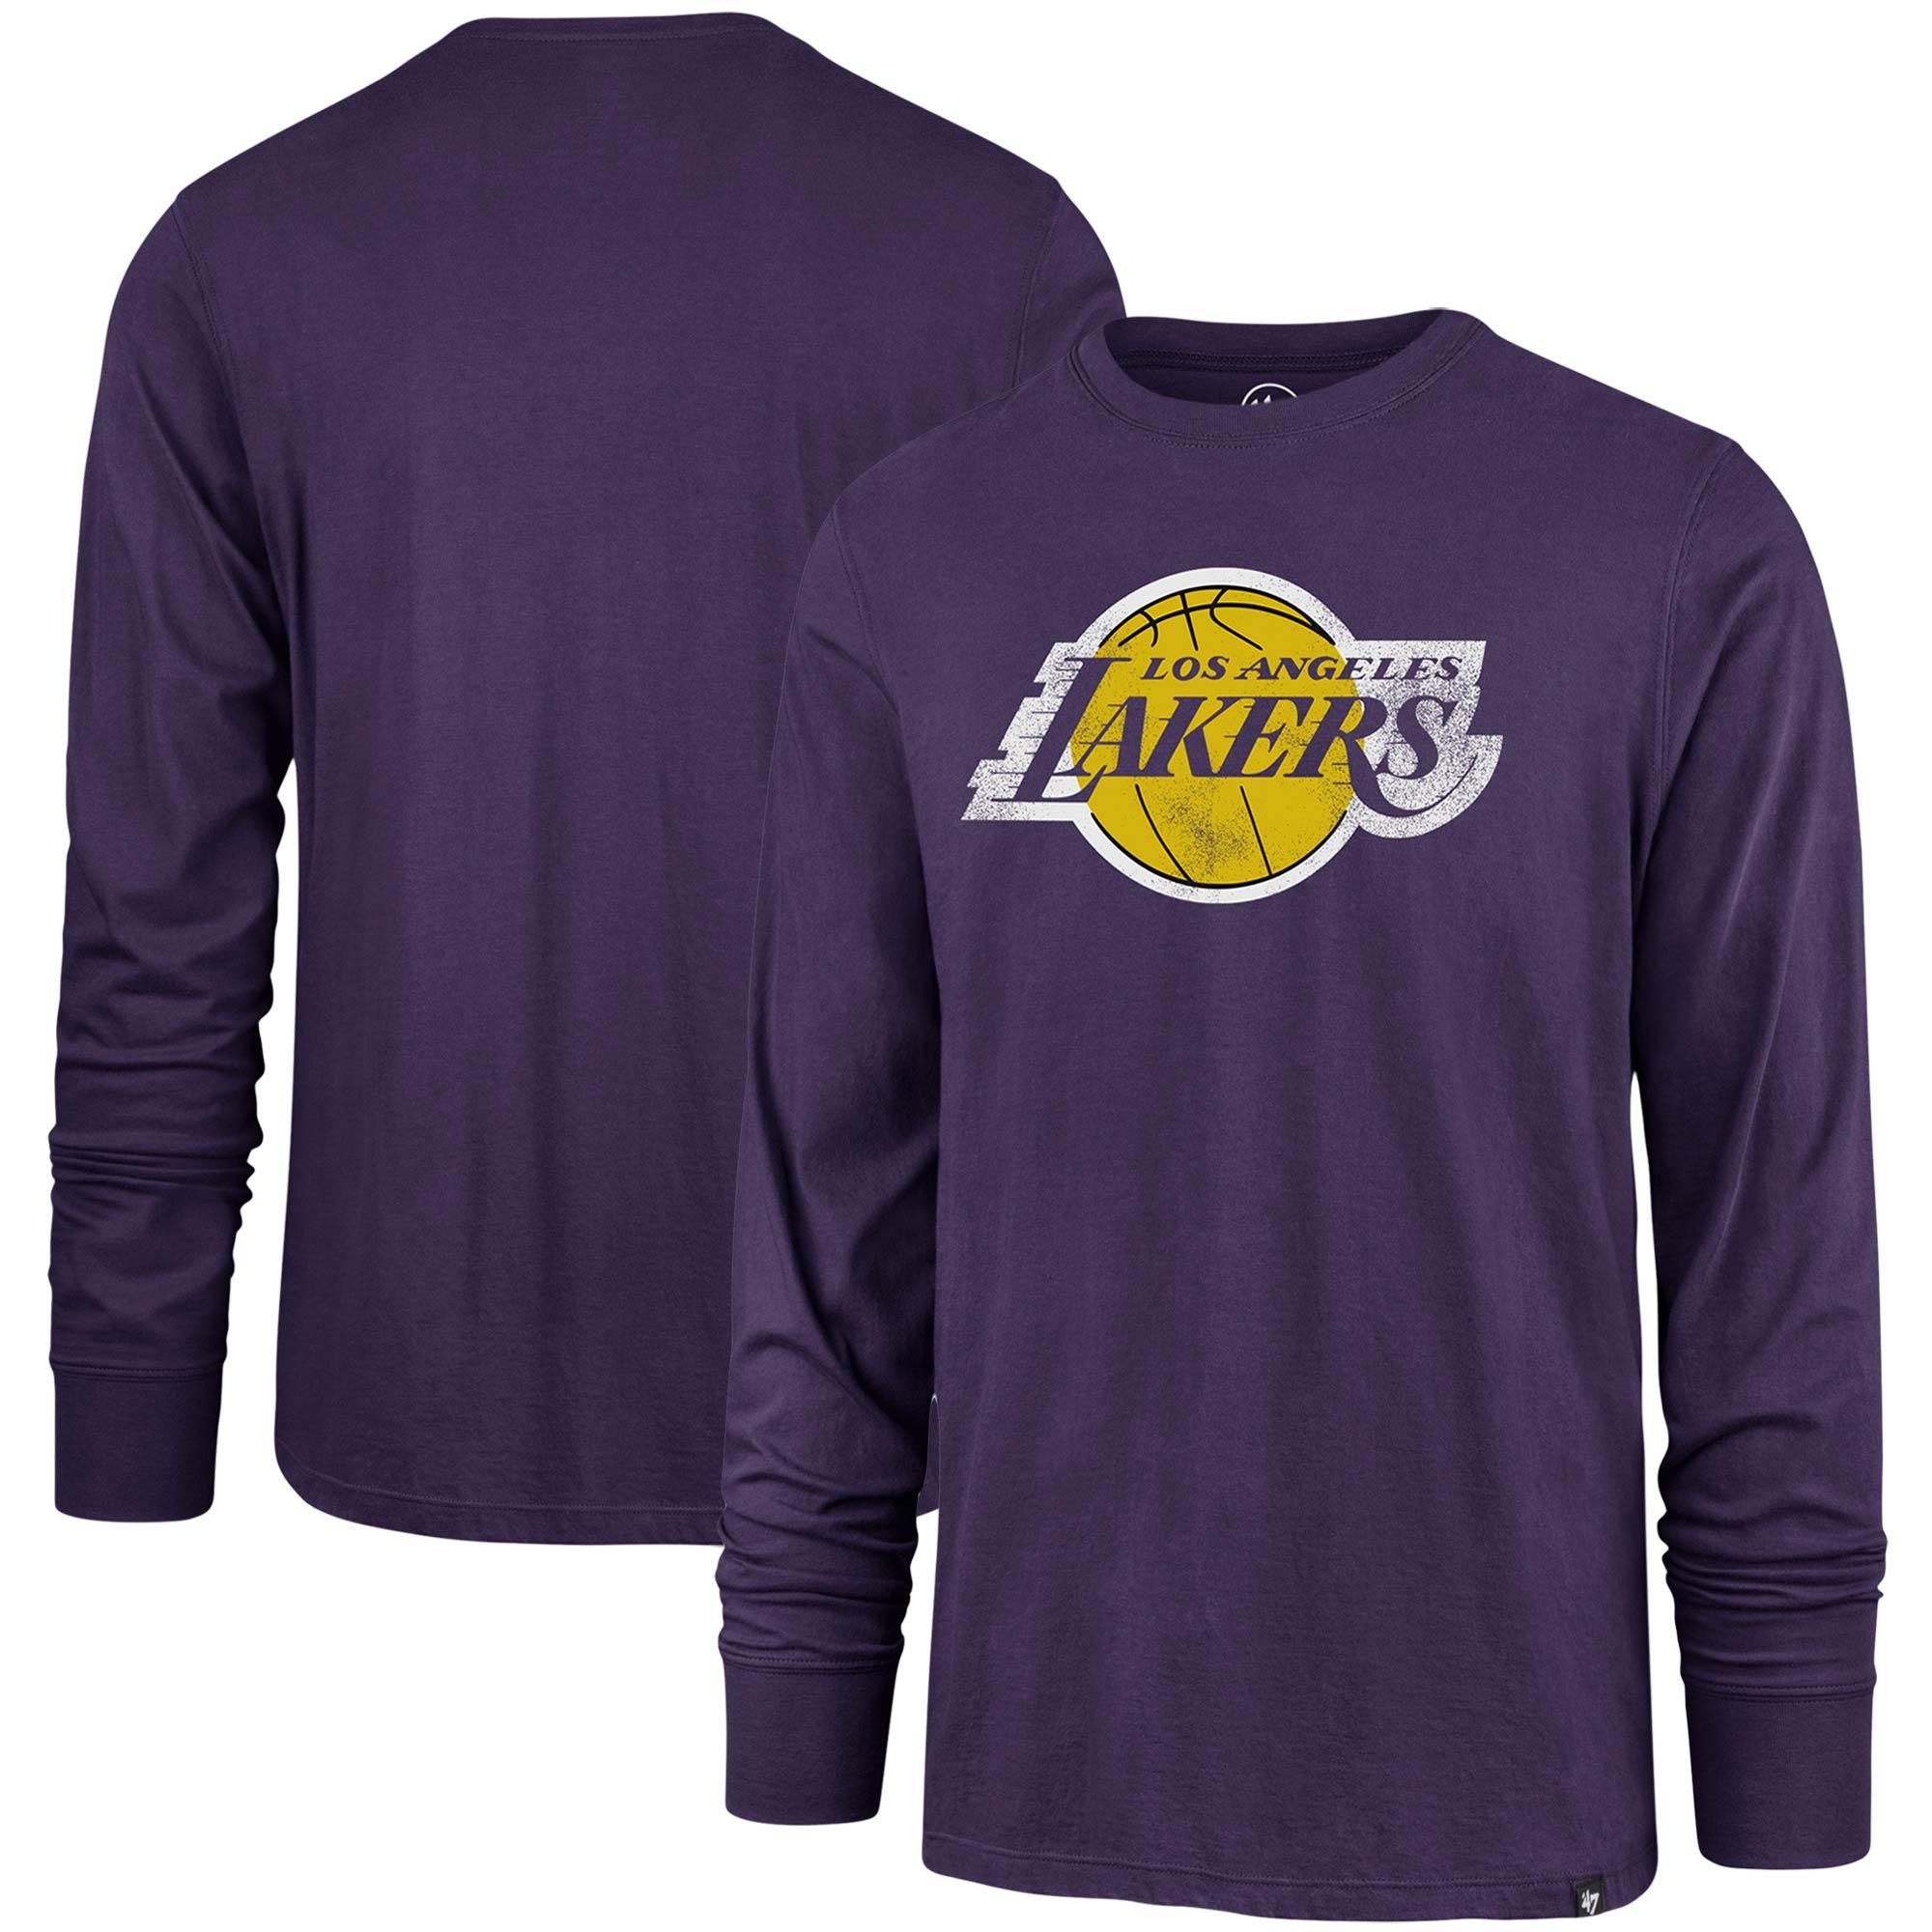 Los Angeles Lakers '47 Super Rival Long Sleeve T-Shirt - Purple ...